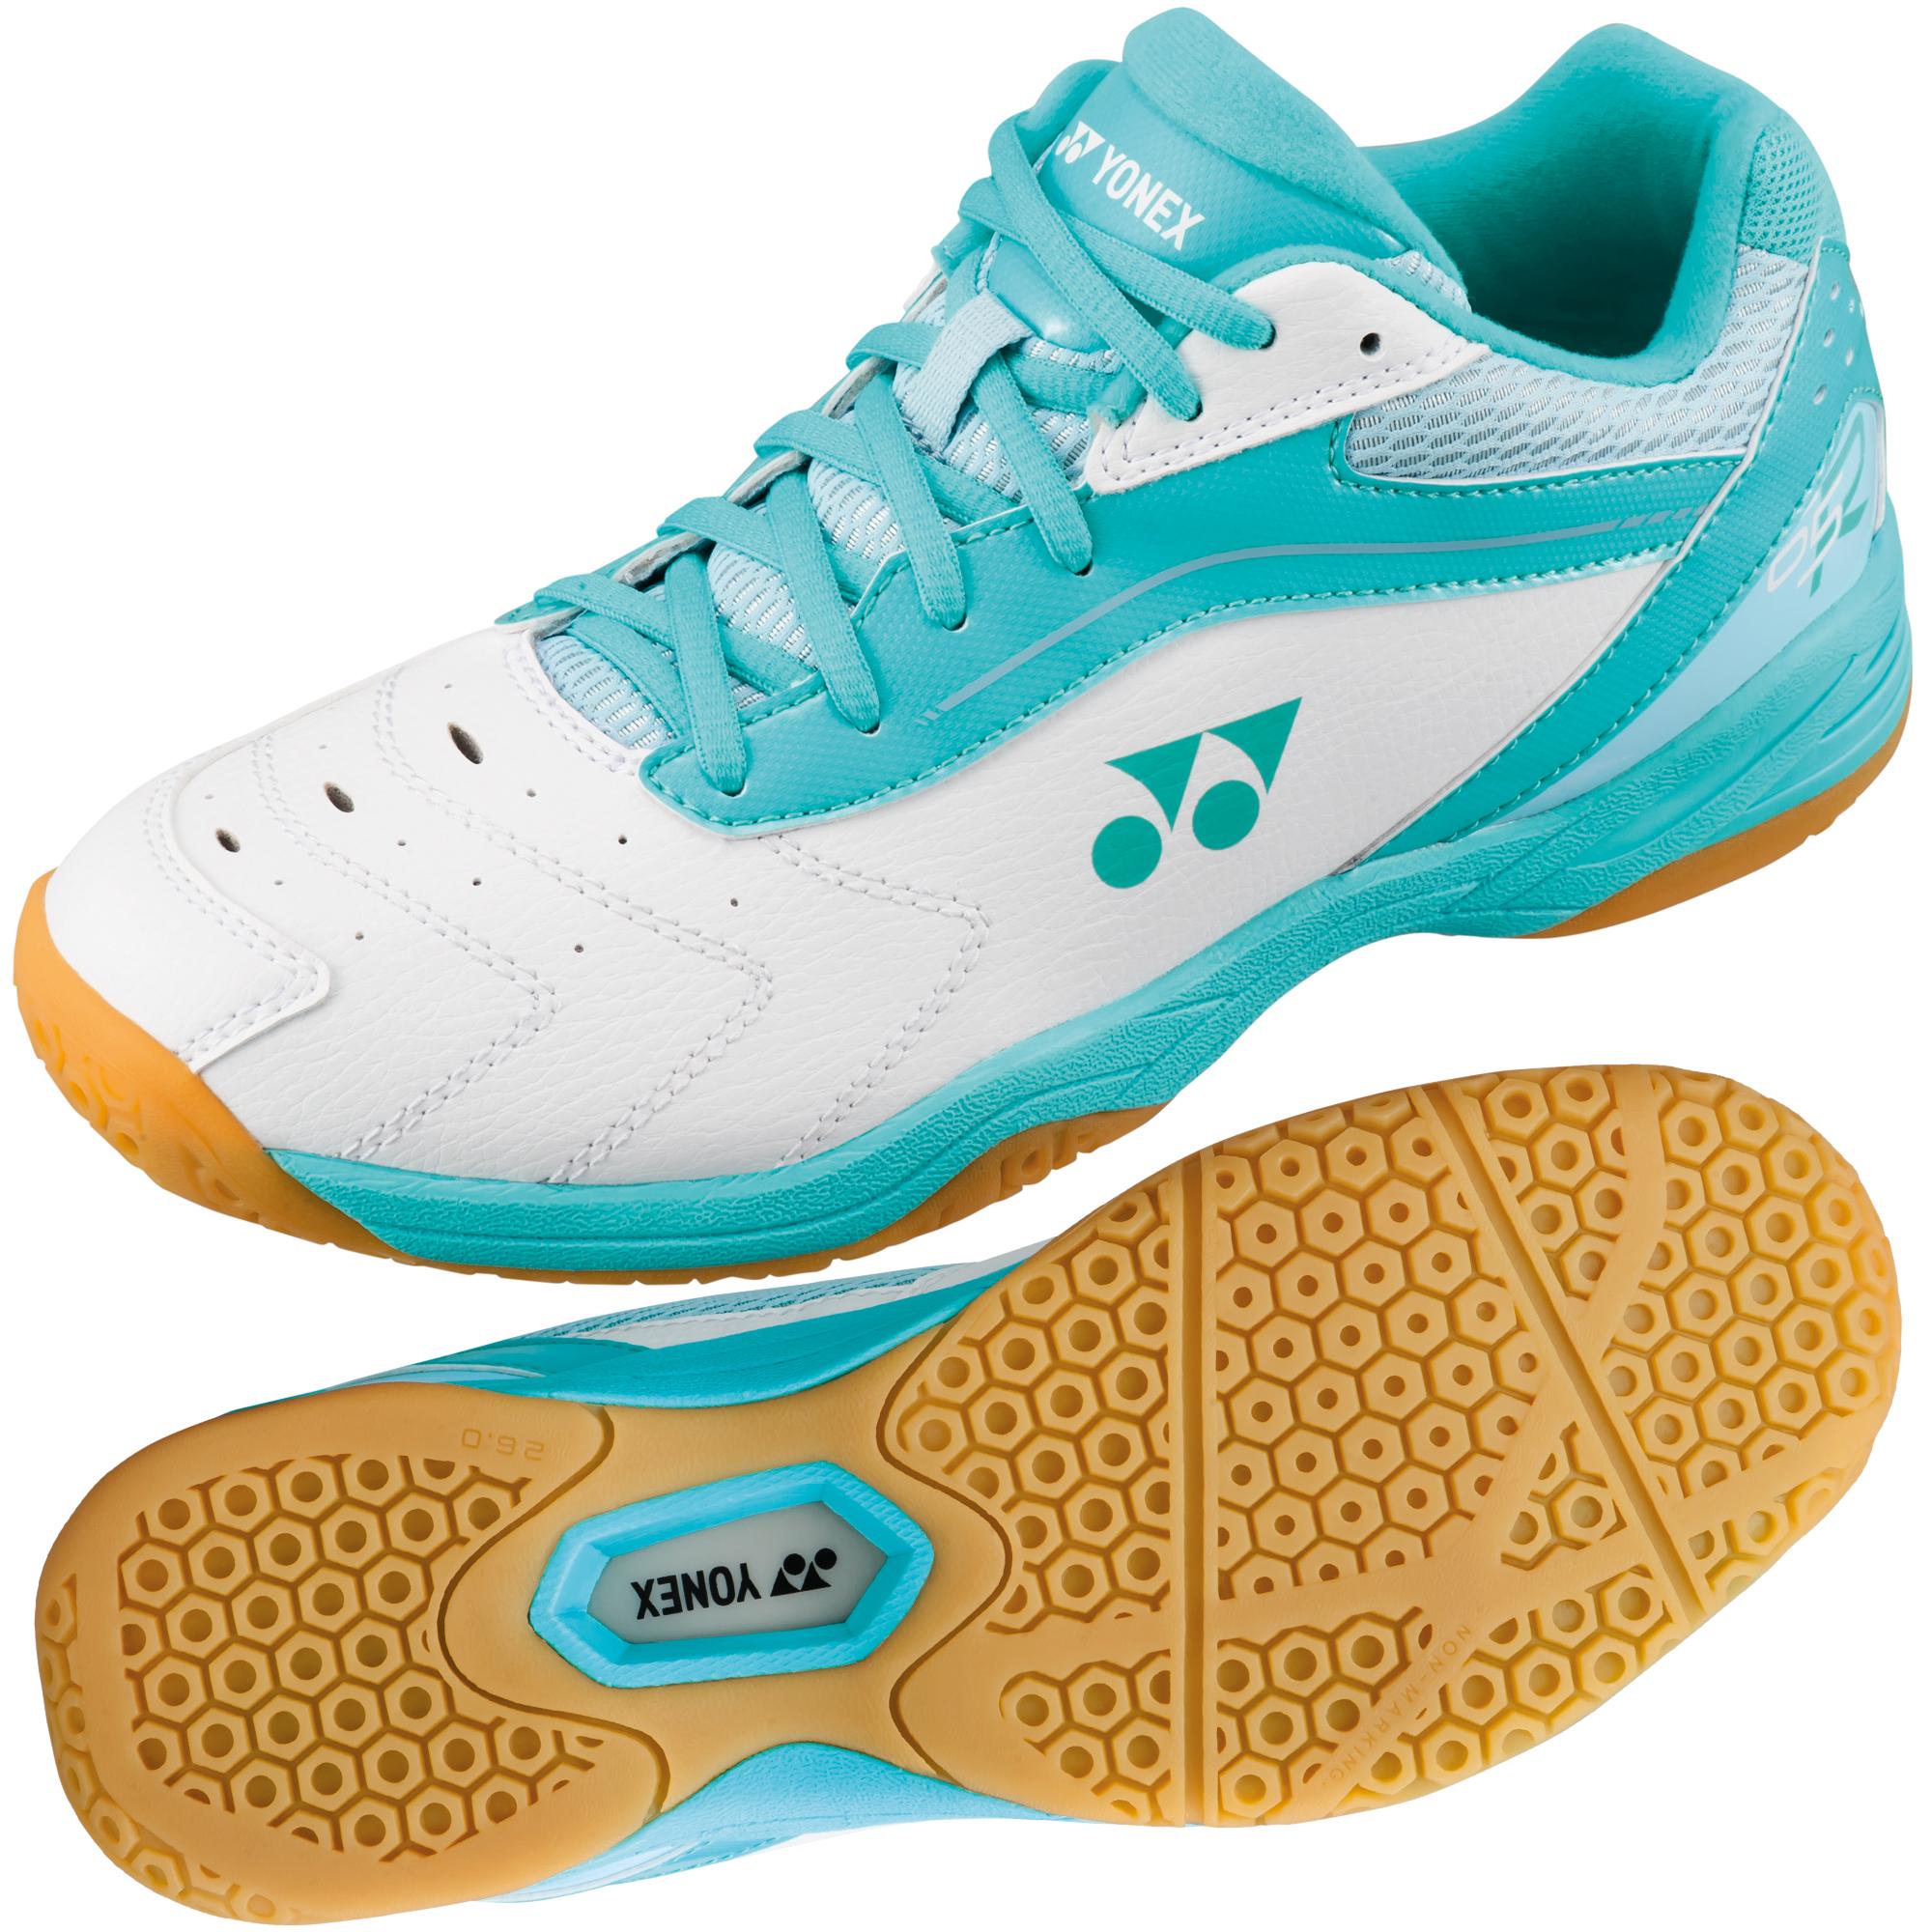 Yonex Power Cushion 65R Ladies Badminton Shoes  4.5 UK